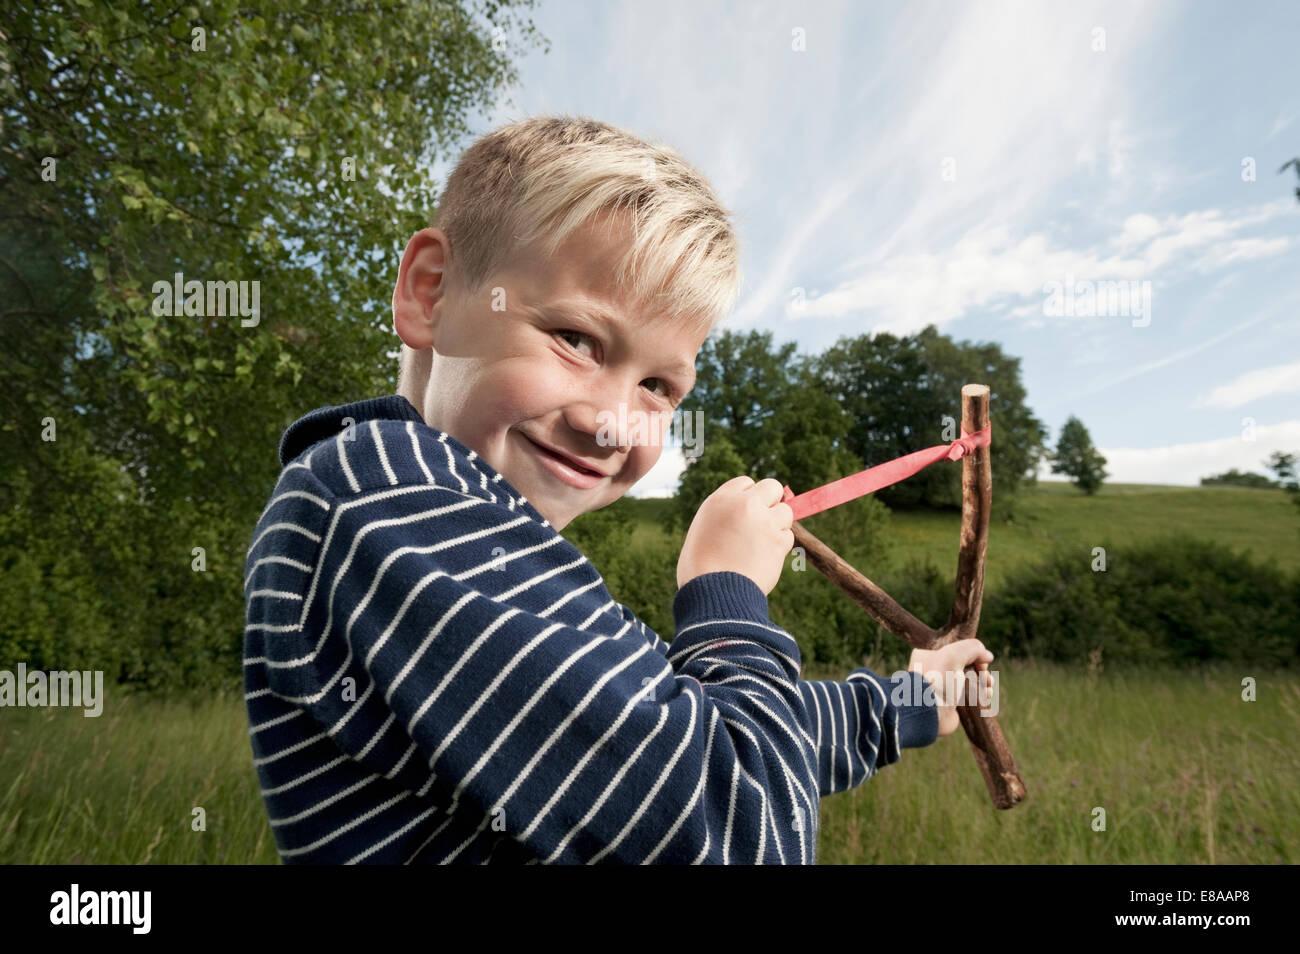 Impertinente muchacho slingshot rubia sonriendo Imagen De Stock